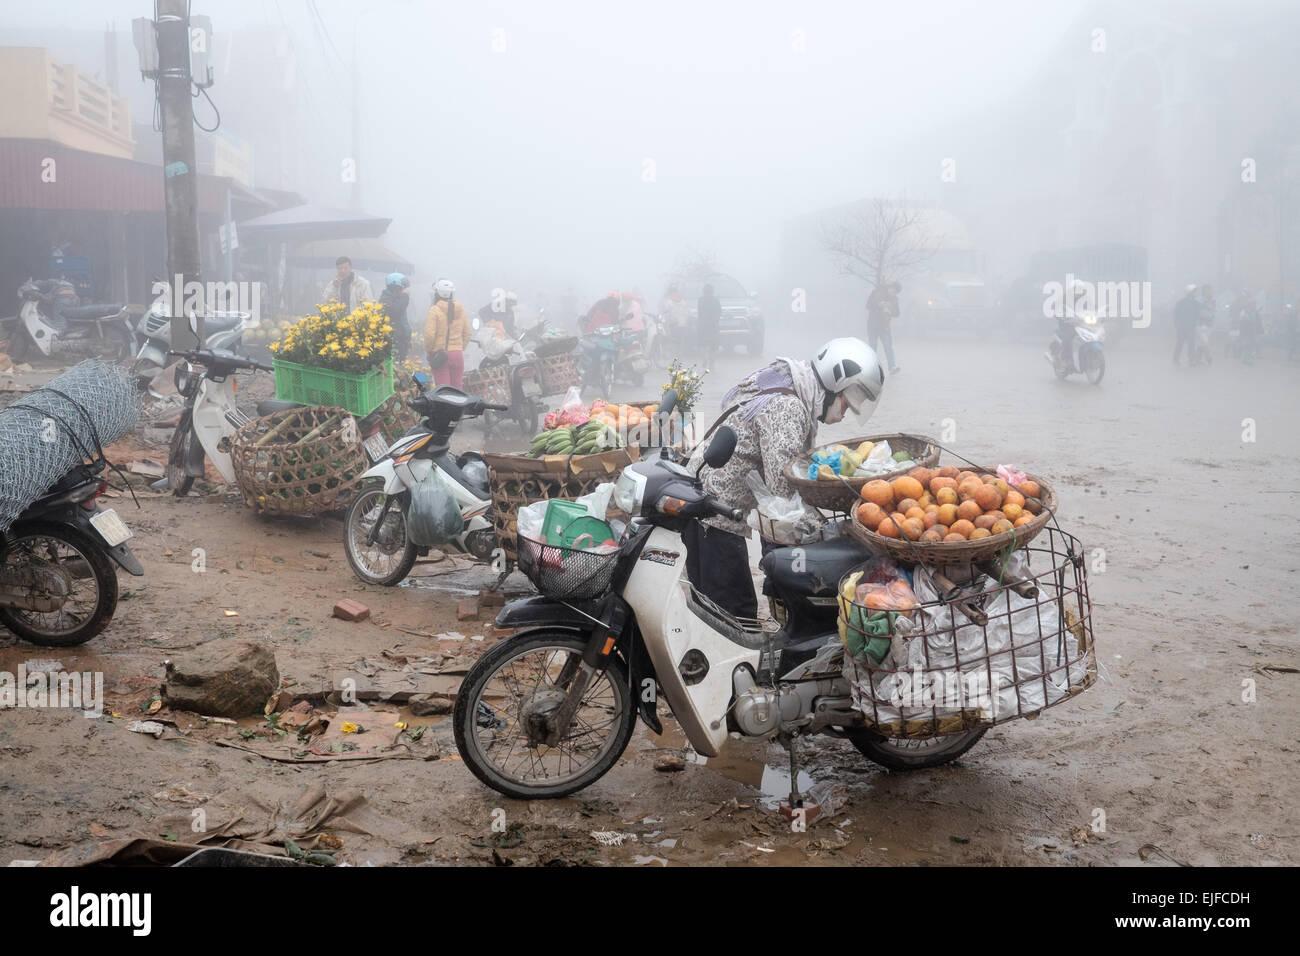 Vietnamese people at a market in Sapa, Vietnam - Stock Image